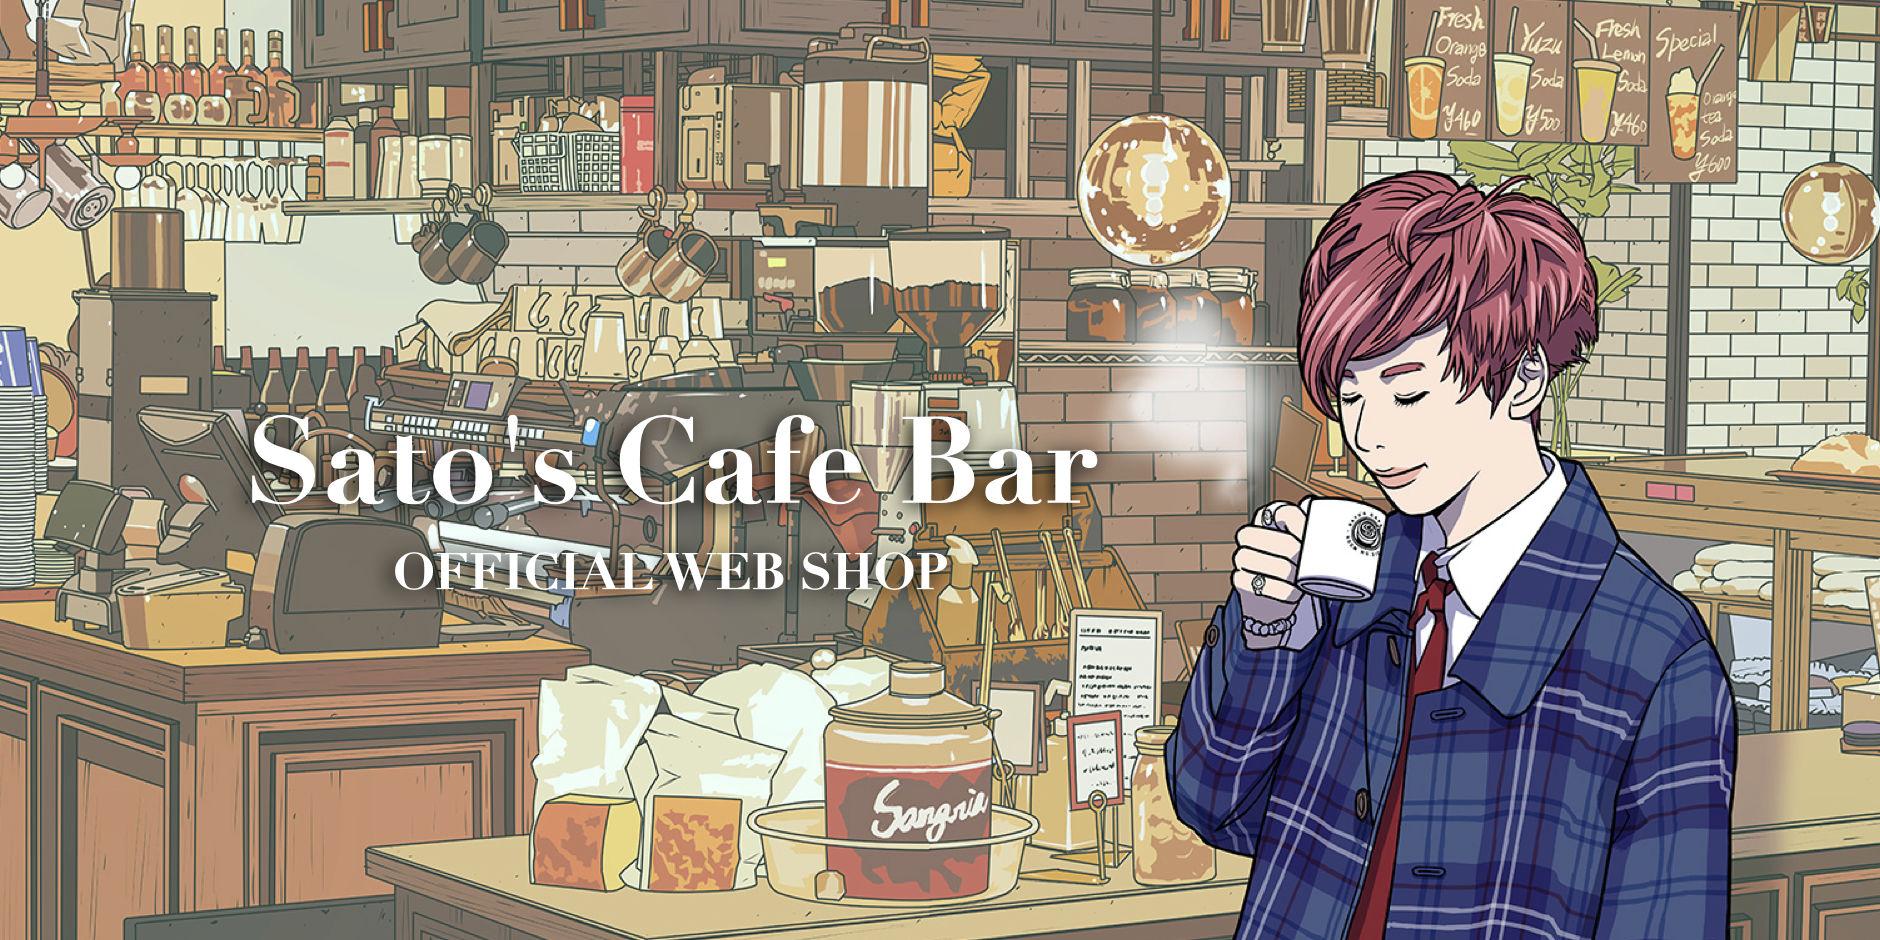 Sato's Cafe Bar